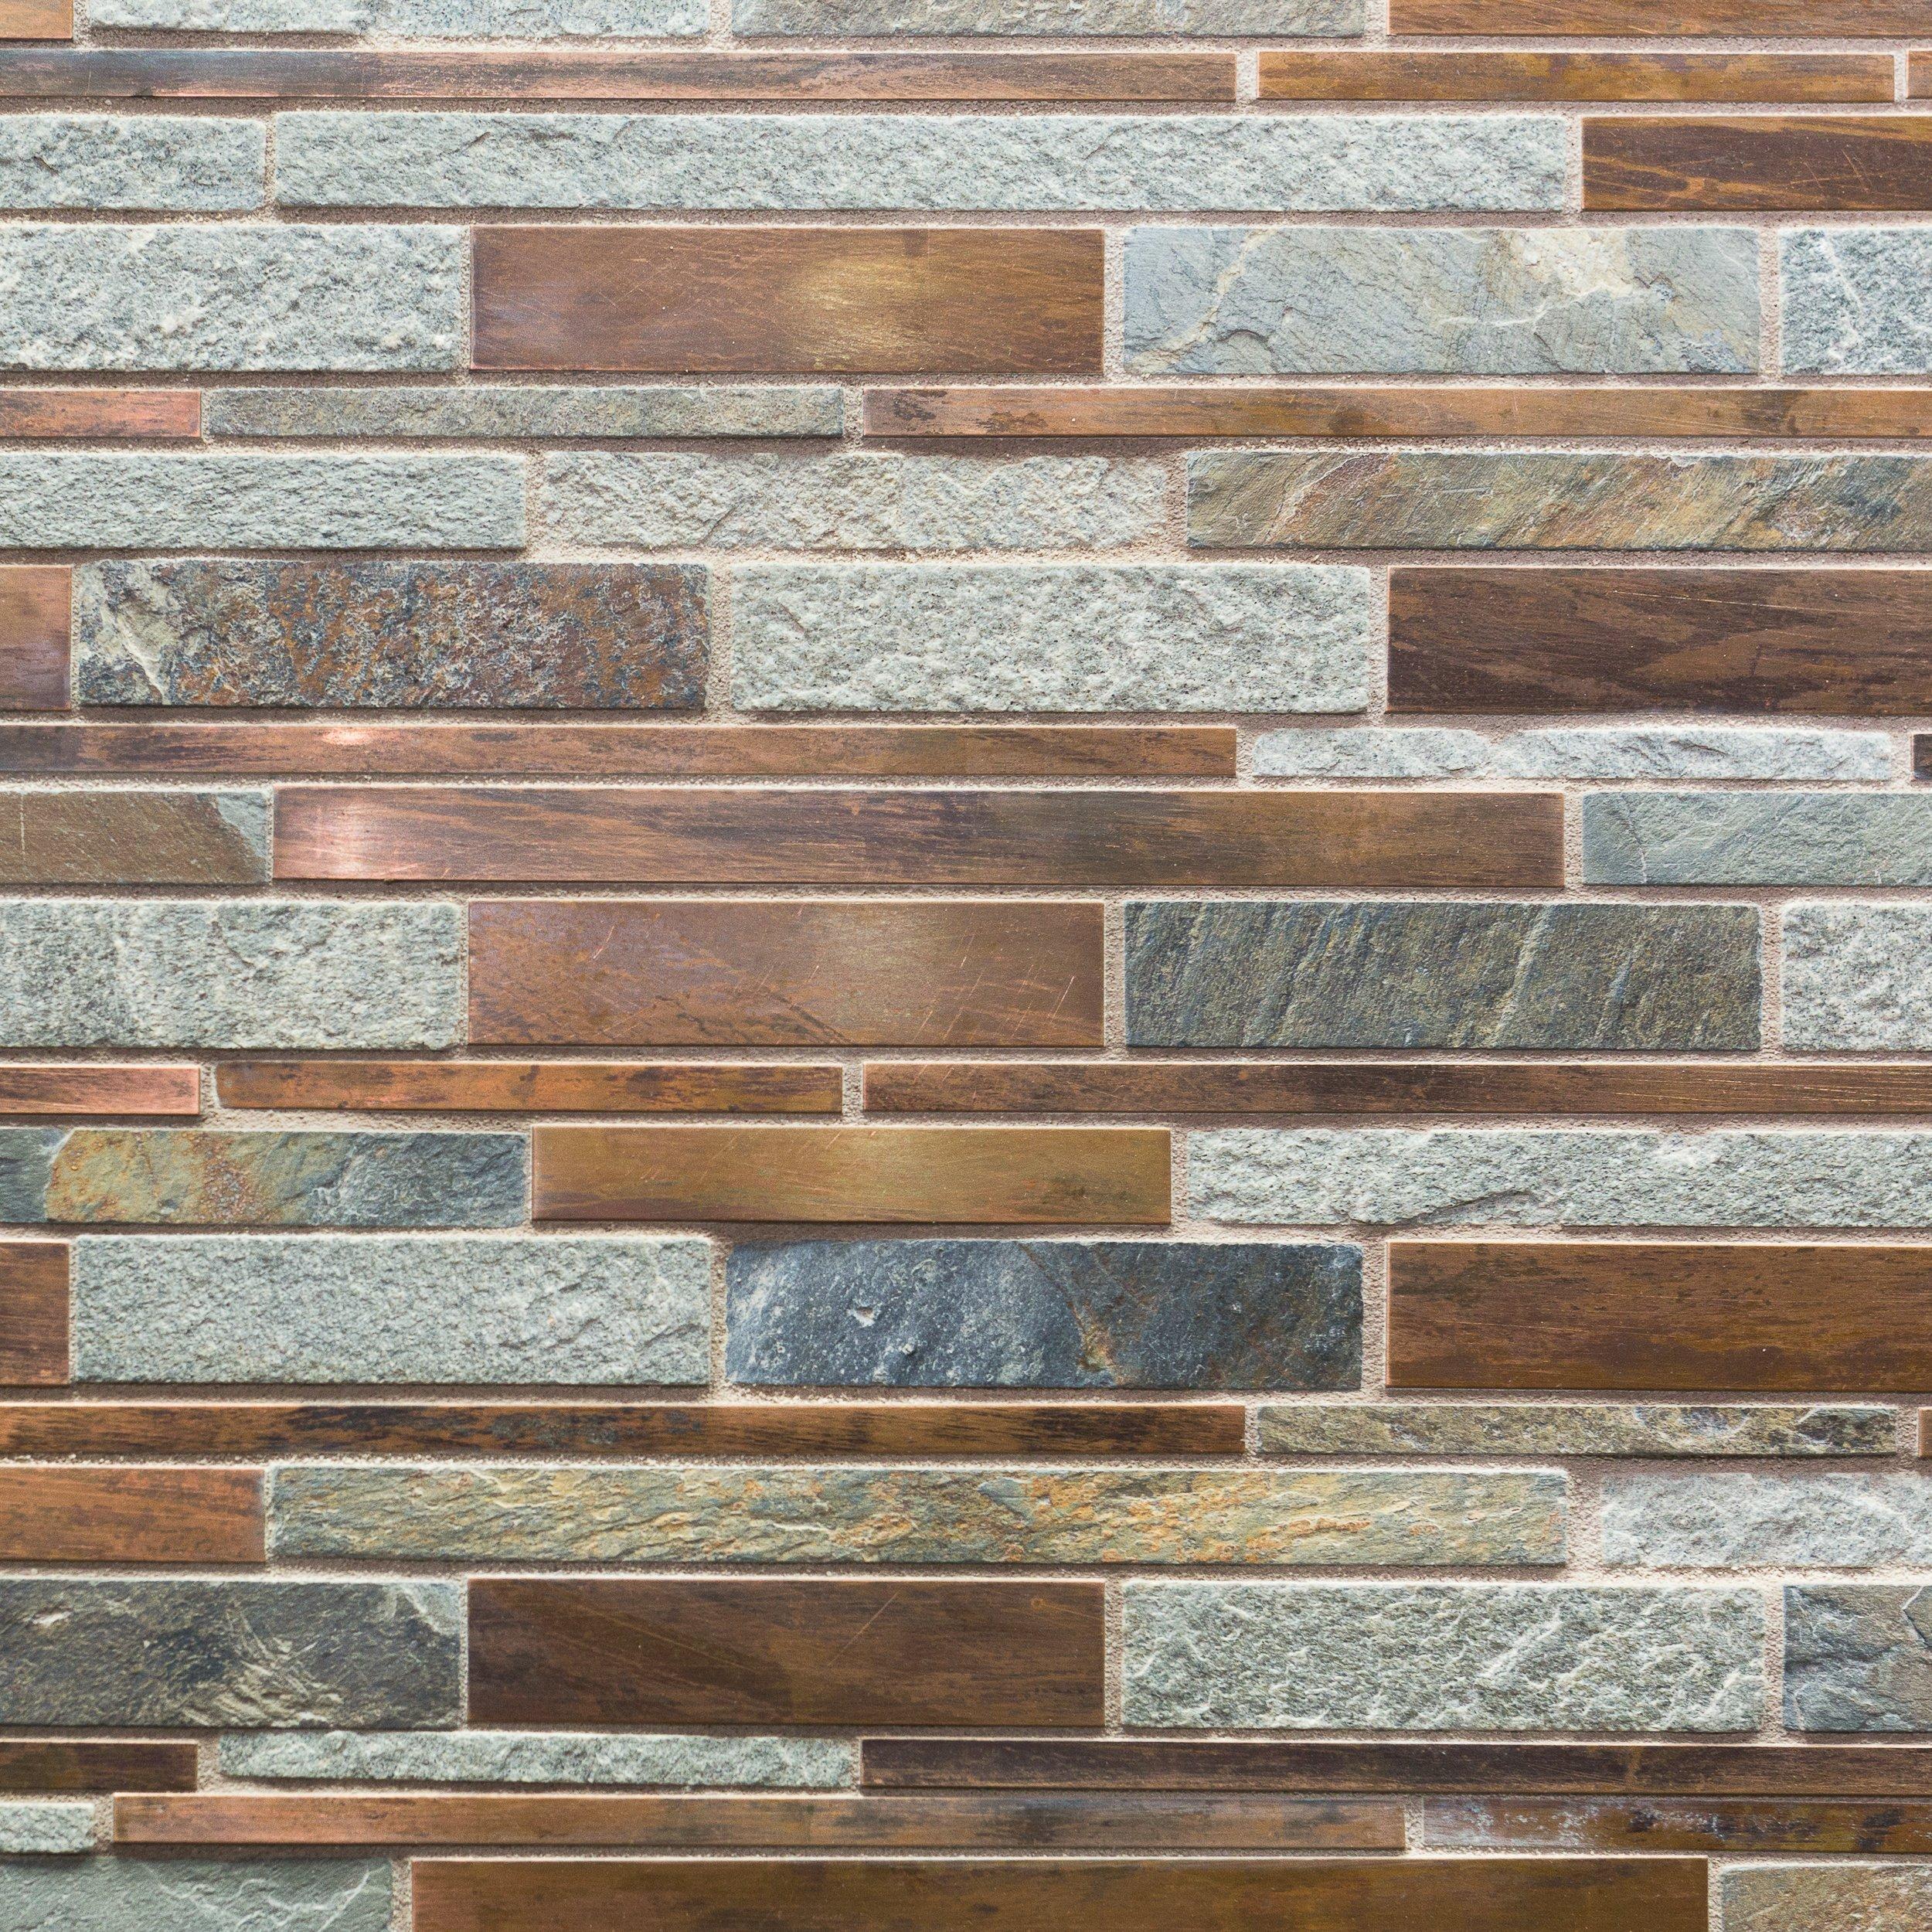 Copper Canyon Metallic Mosaic Floor Decor Copper Mosaic Backsplash Copper Tile Backsplash Copper Backsplash